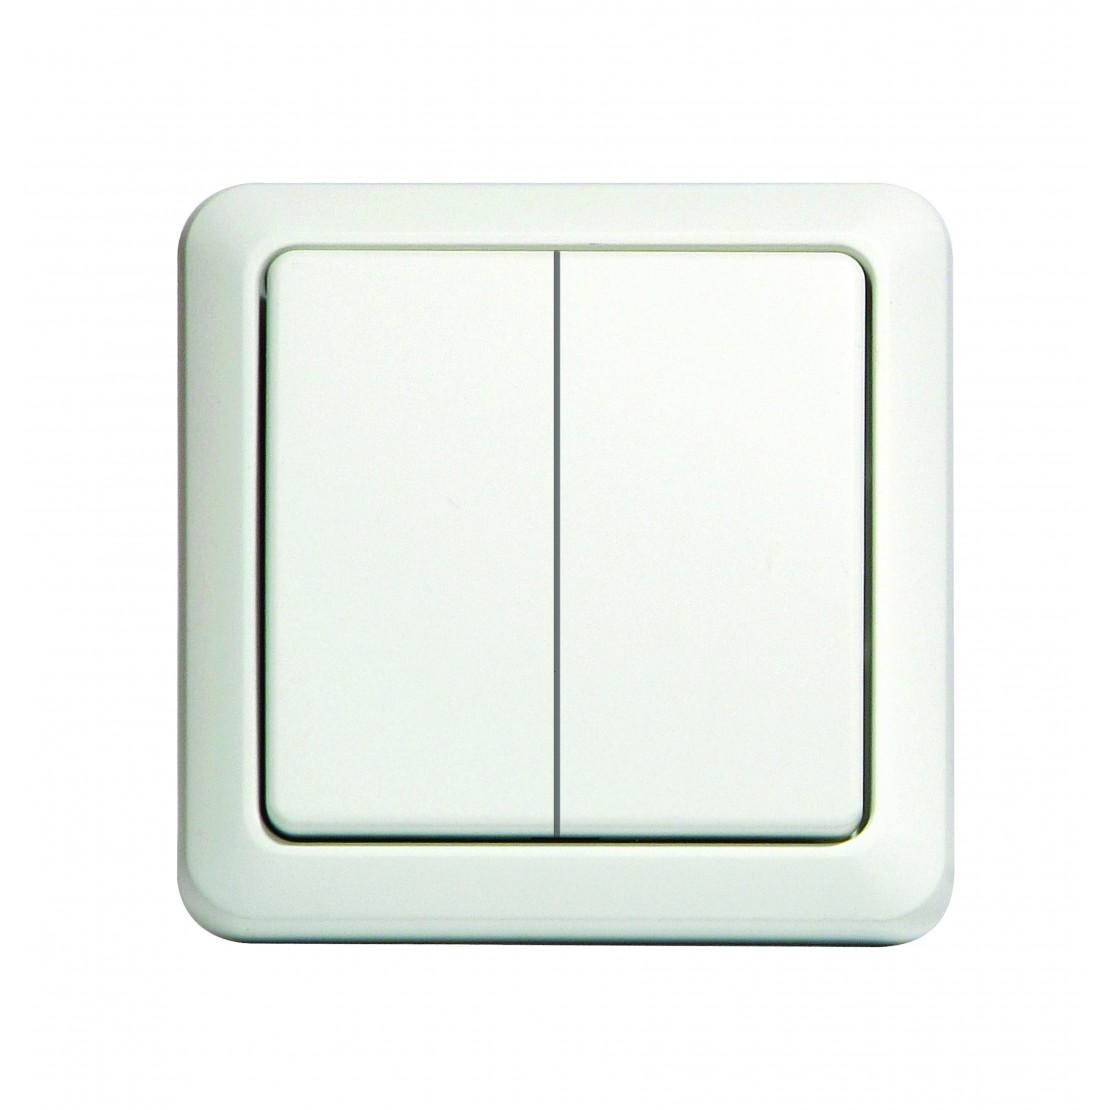 Interruptor doble inalámbrico(blanco)